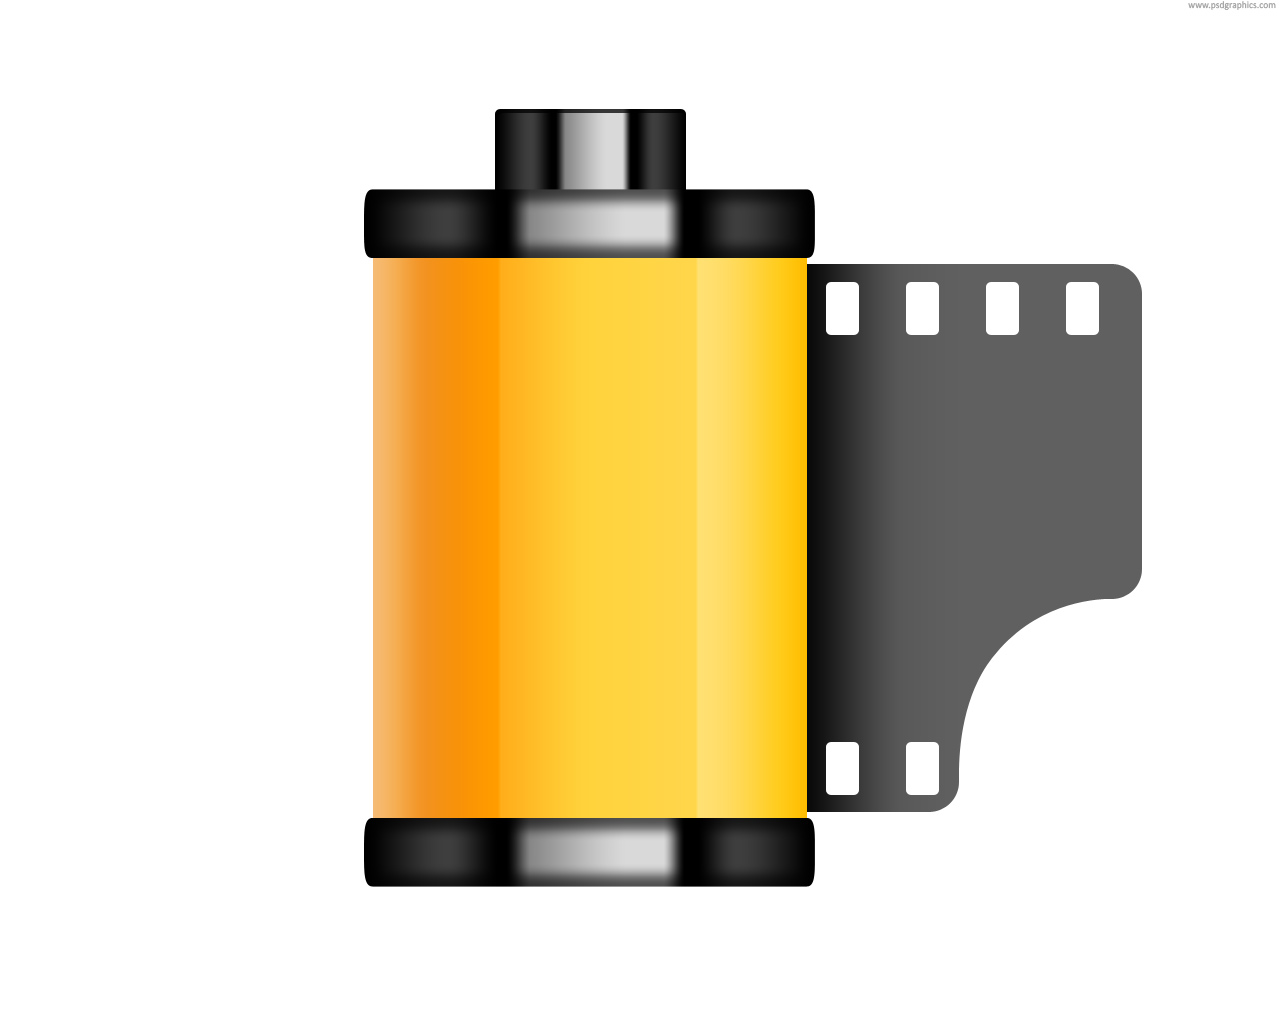 Film Roll Clipart - Clipart Kid